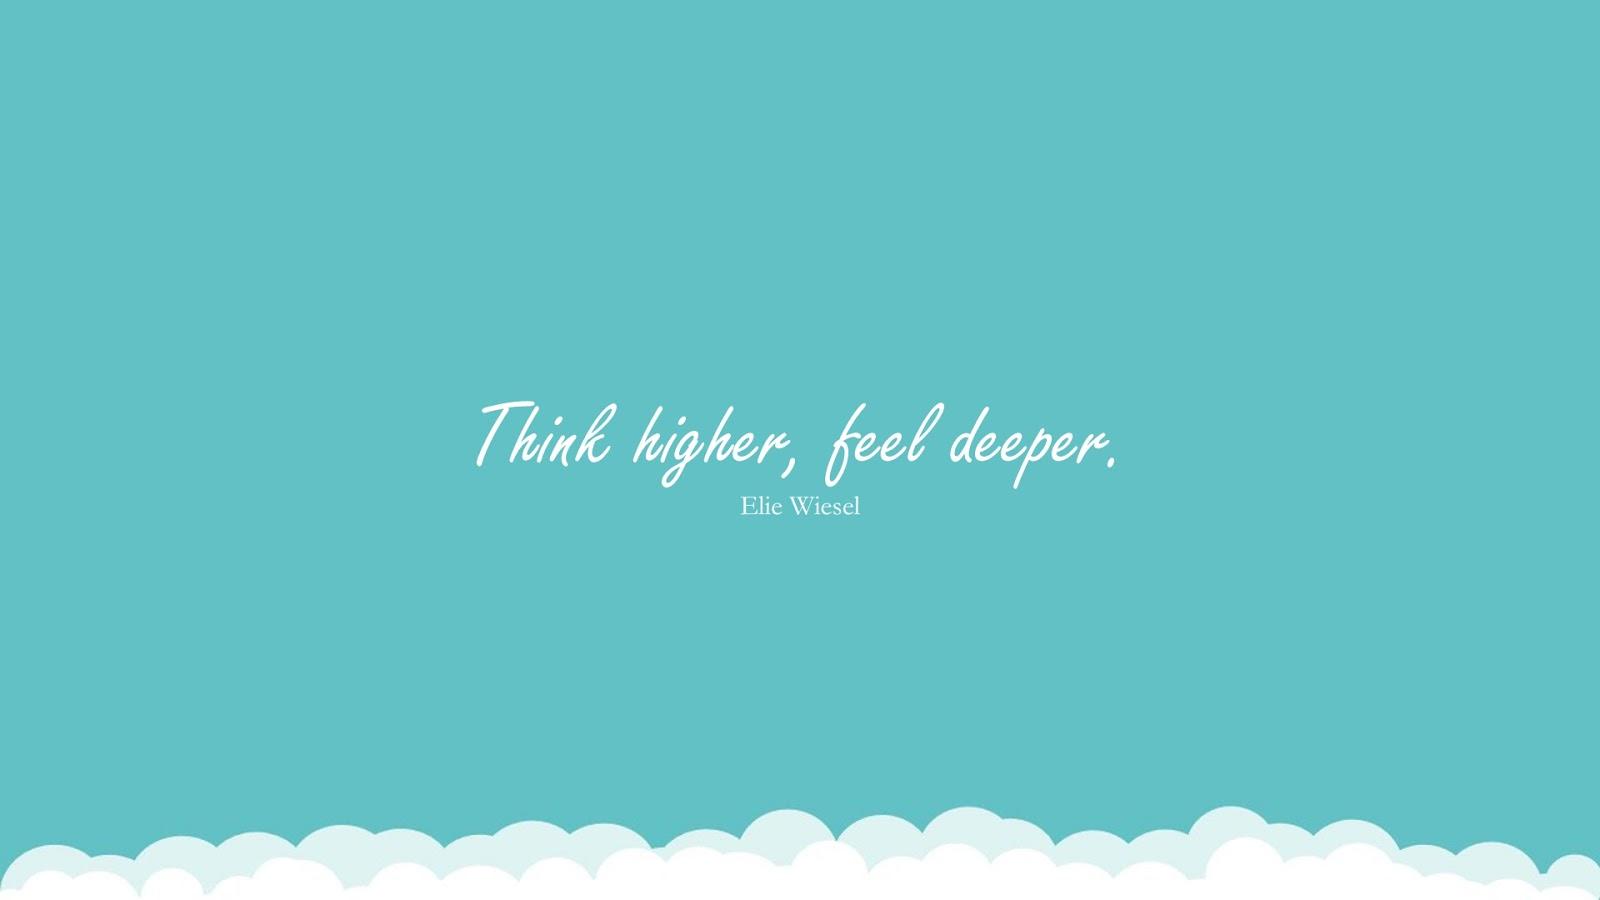 Think higher, feel deeper. (Elie Wiesel);  #HumanityQuotes